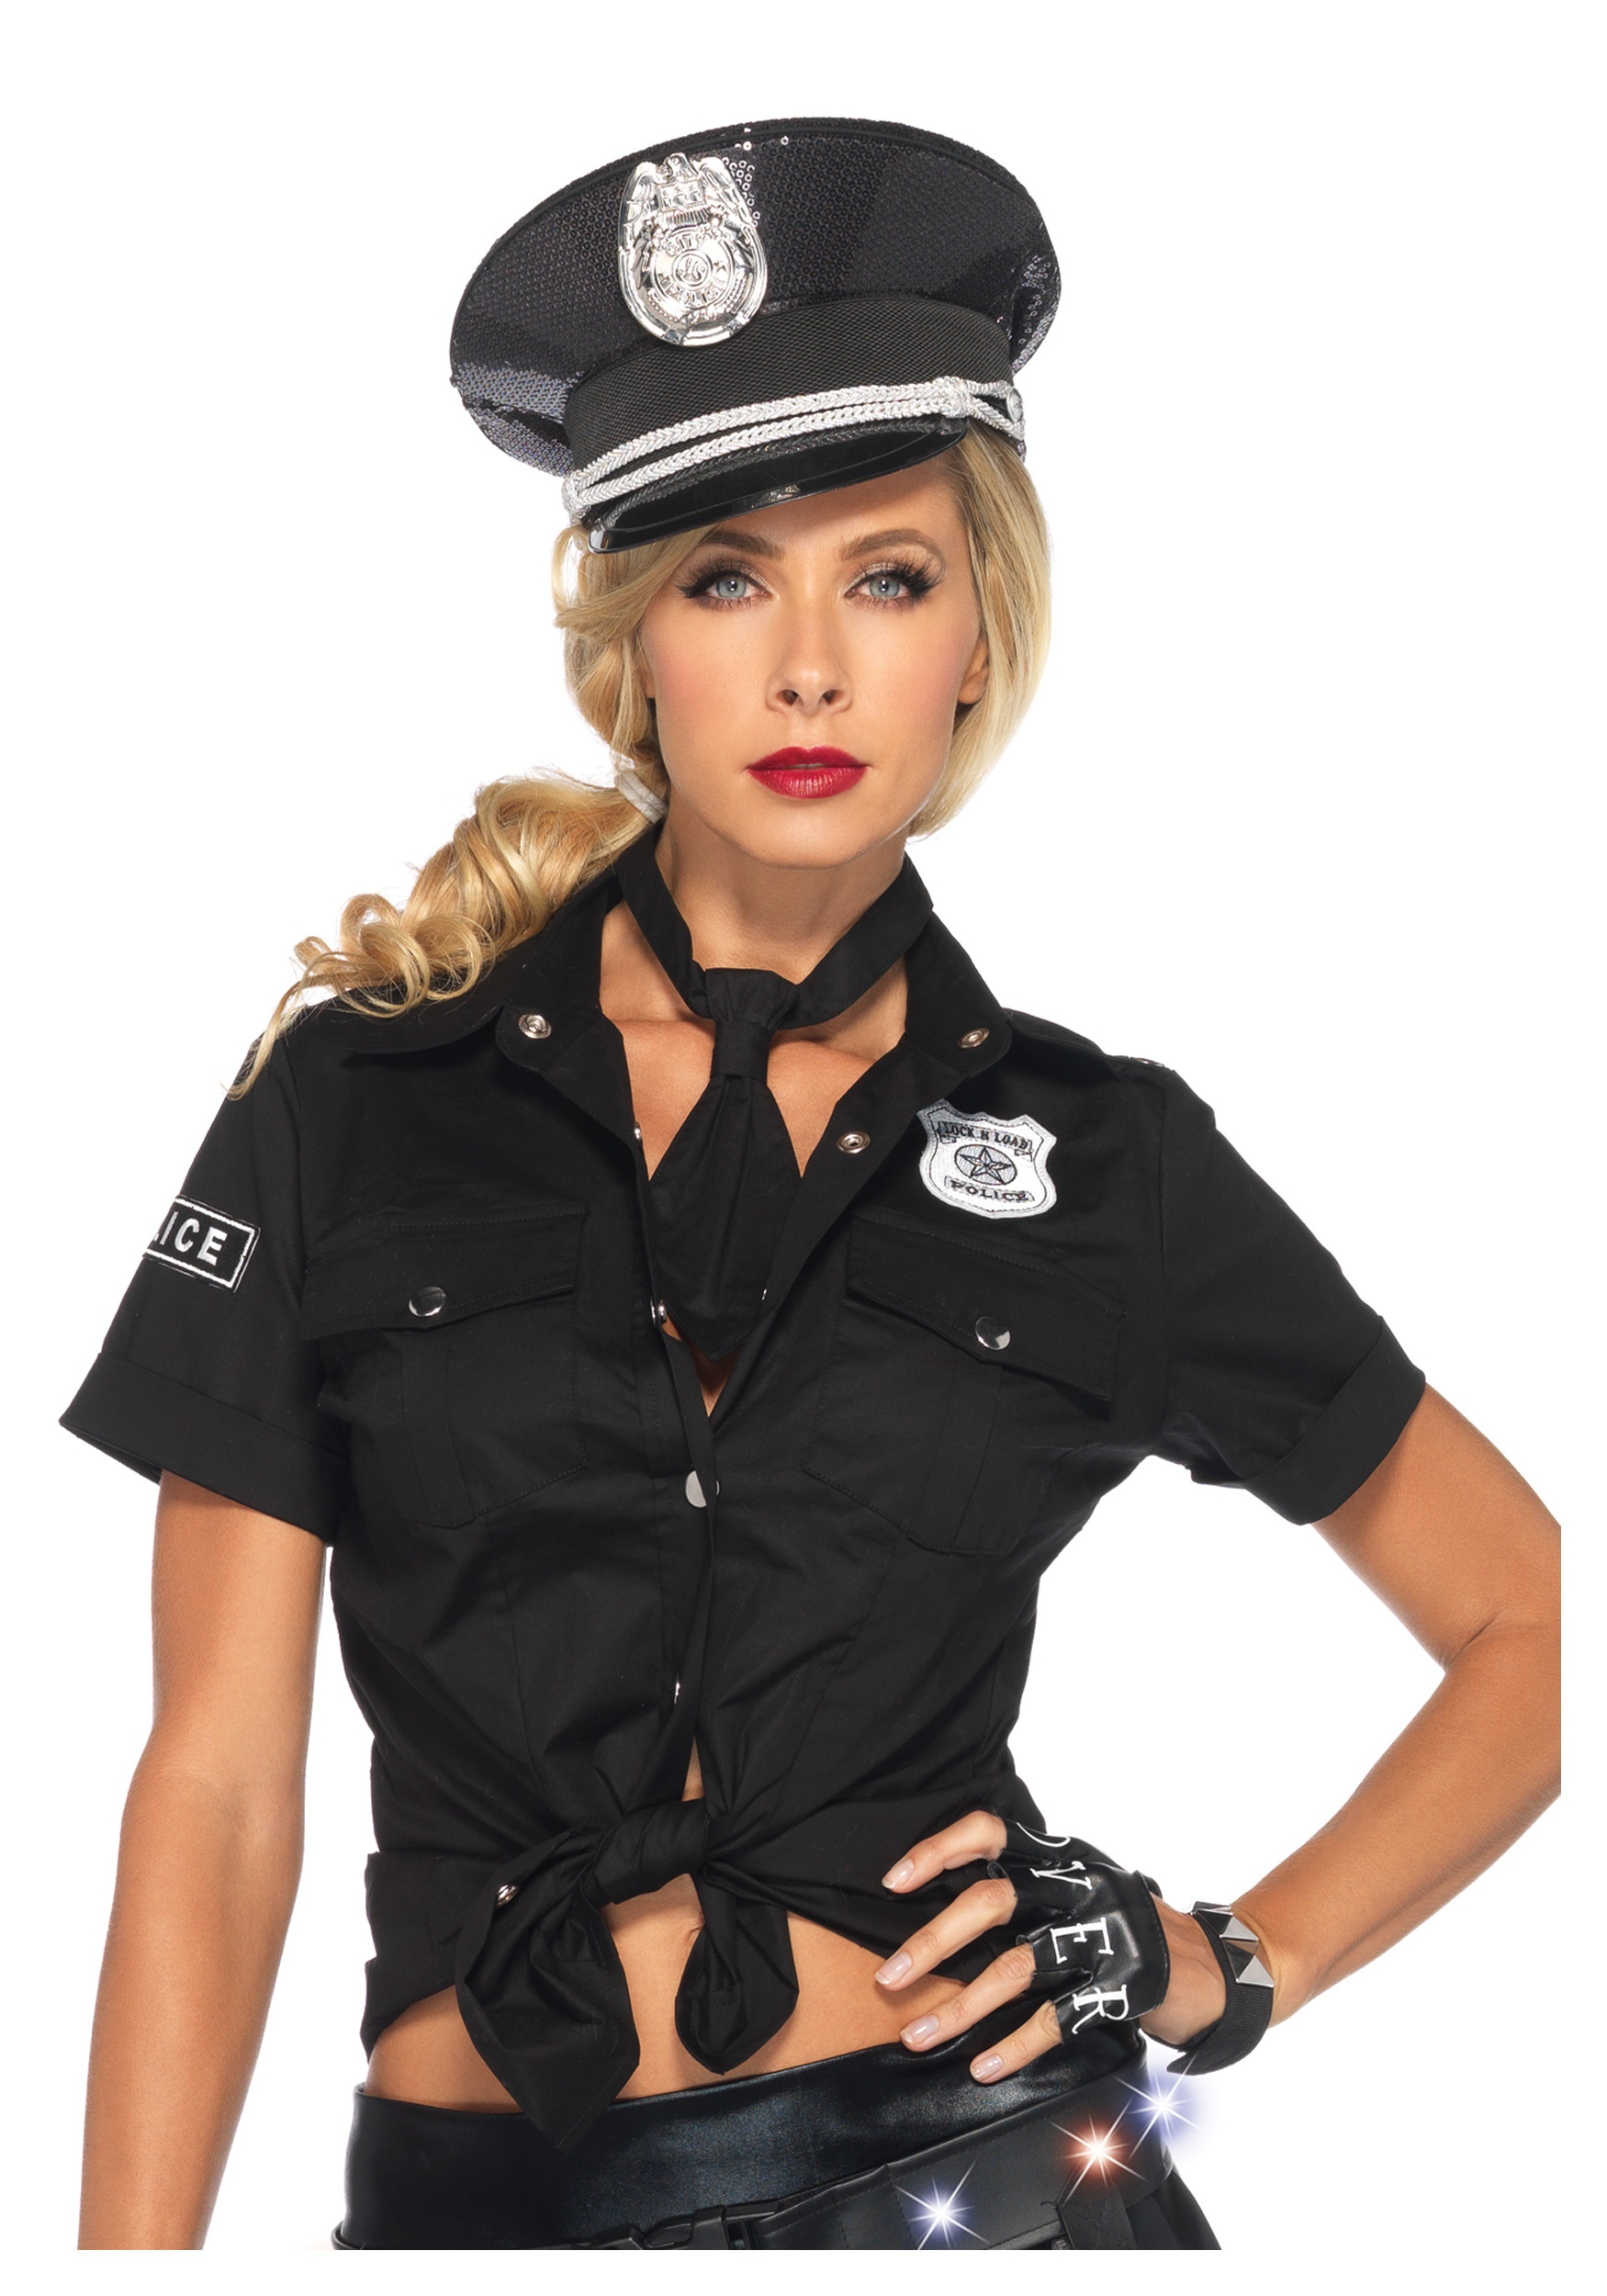 Womens Police Shirt u0026 Tie  sc 1 st  Halloween Costumes & Womens Police Shirt u0026 Tie - Halloween Costumes